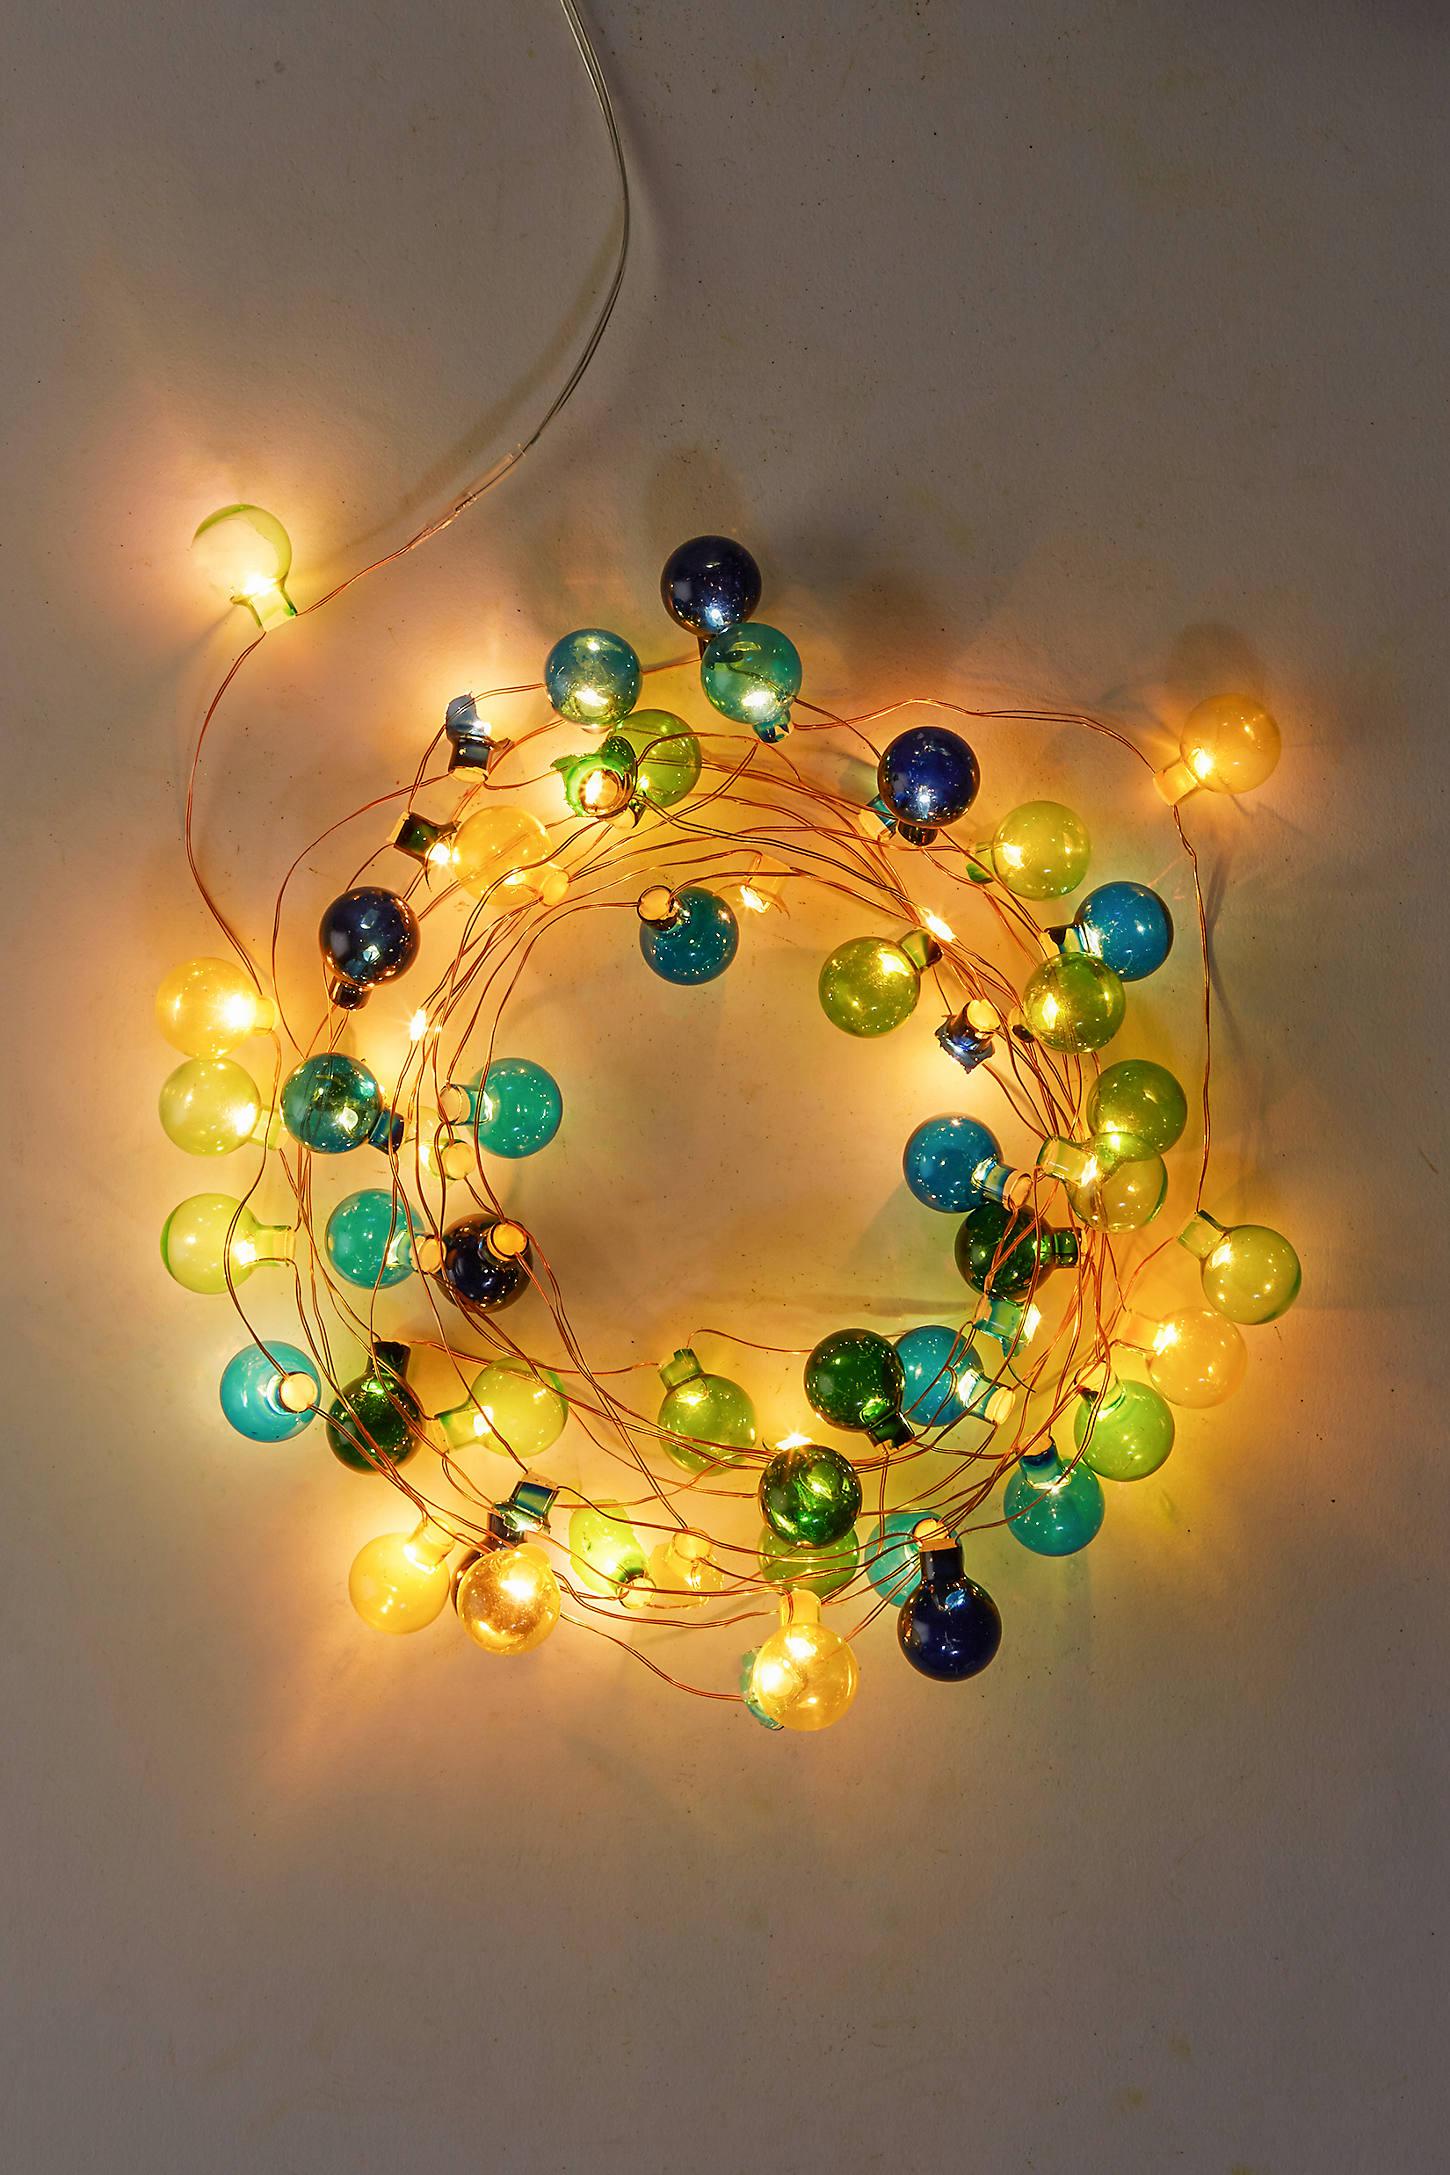 Stargazer Bubble Lights, 15' Battery Powered